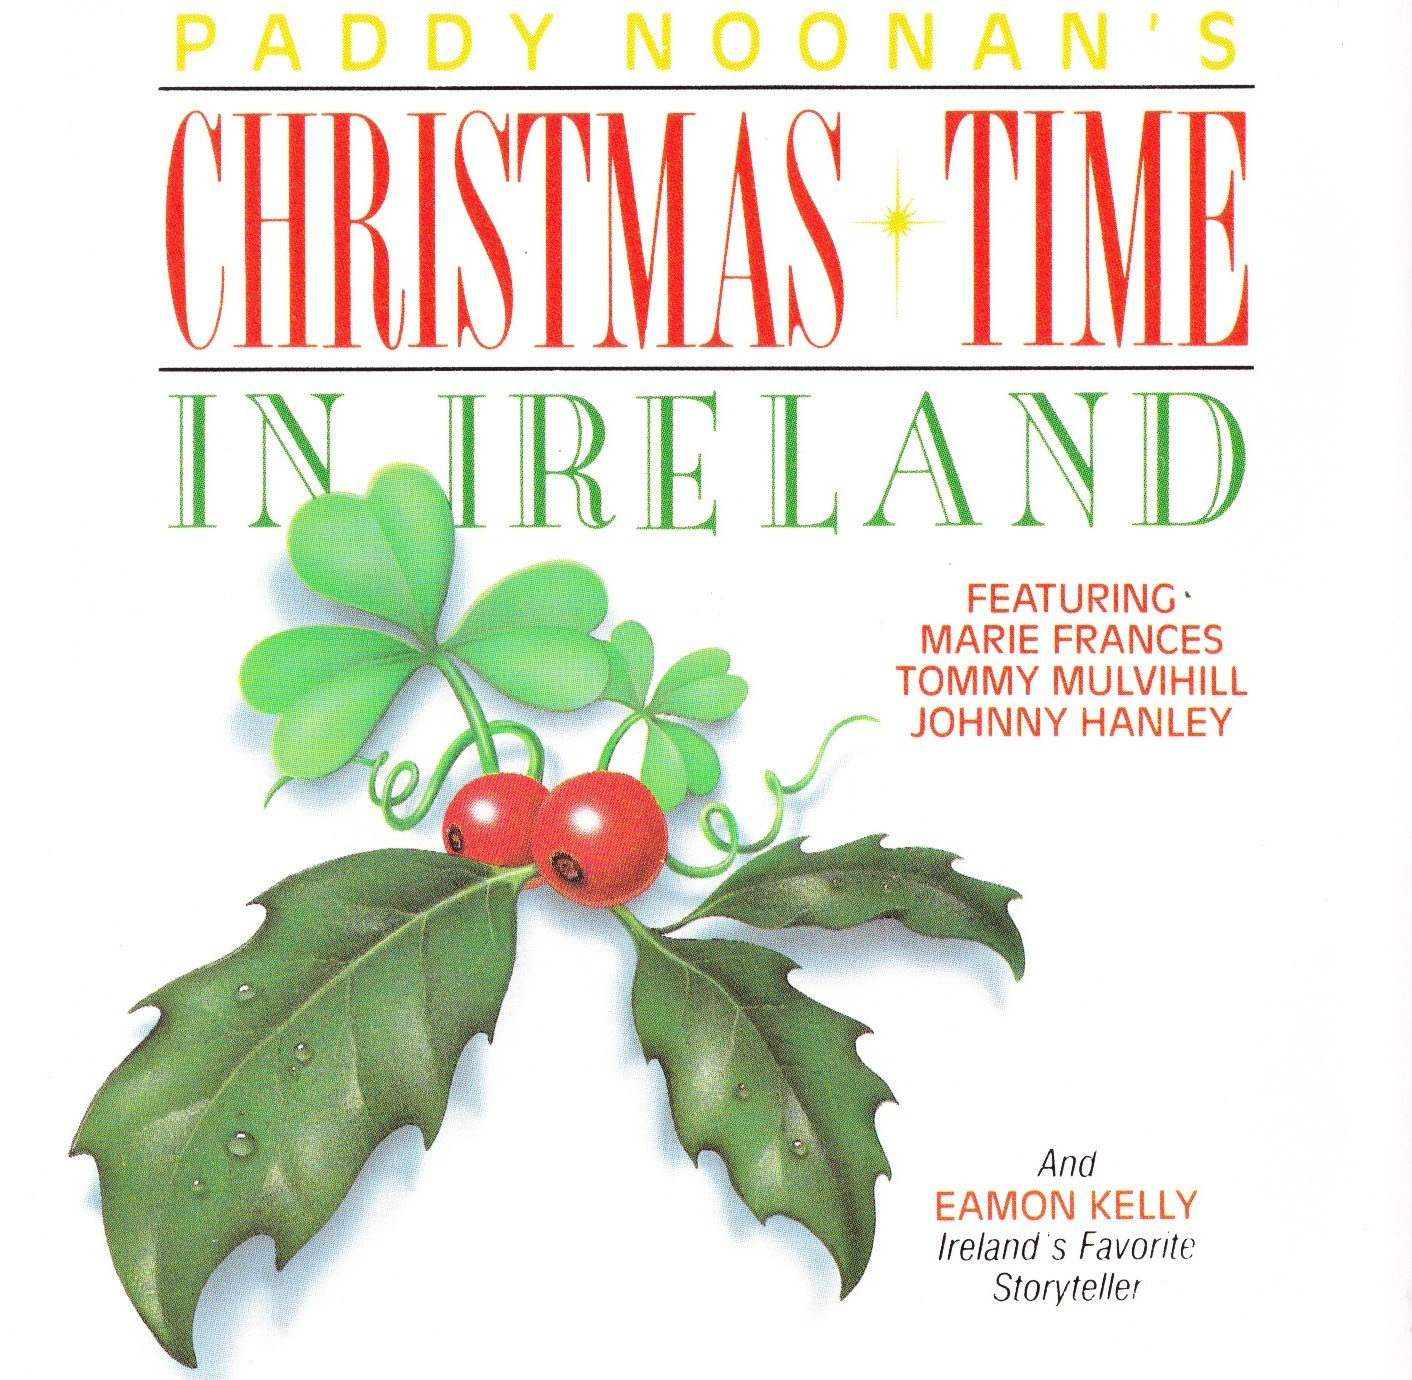 Paddy Noonan - Christmas Time in Ireland - Amazon.com Music